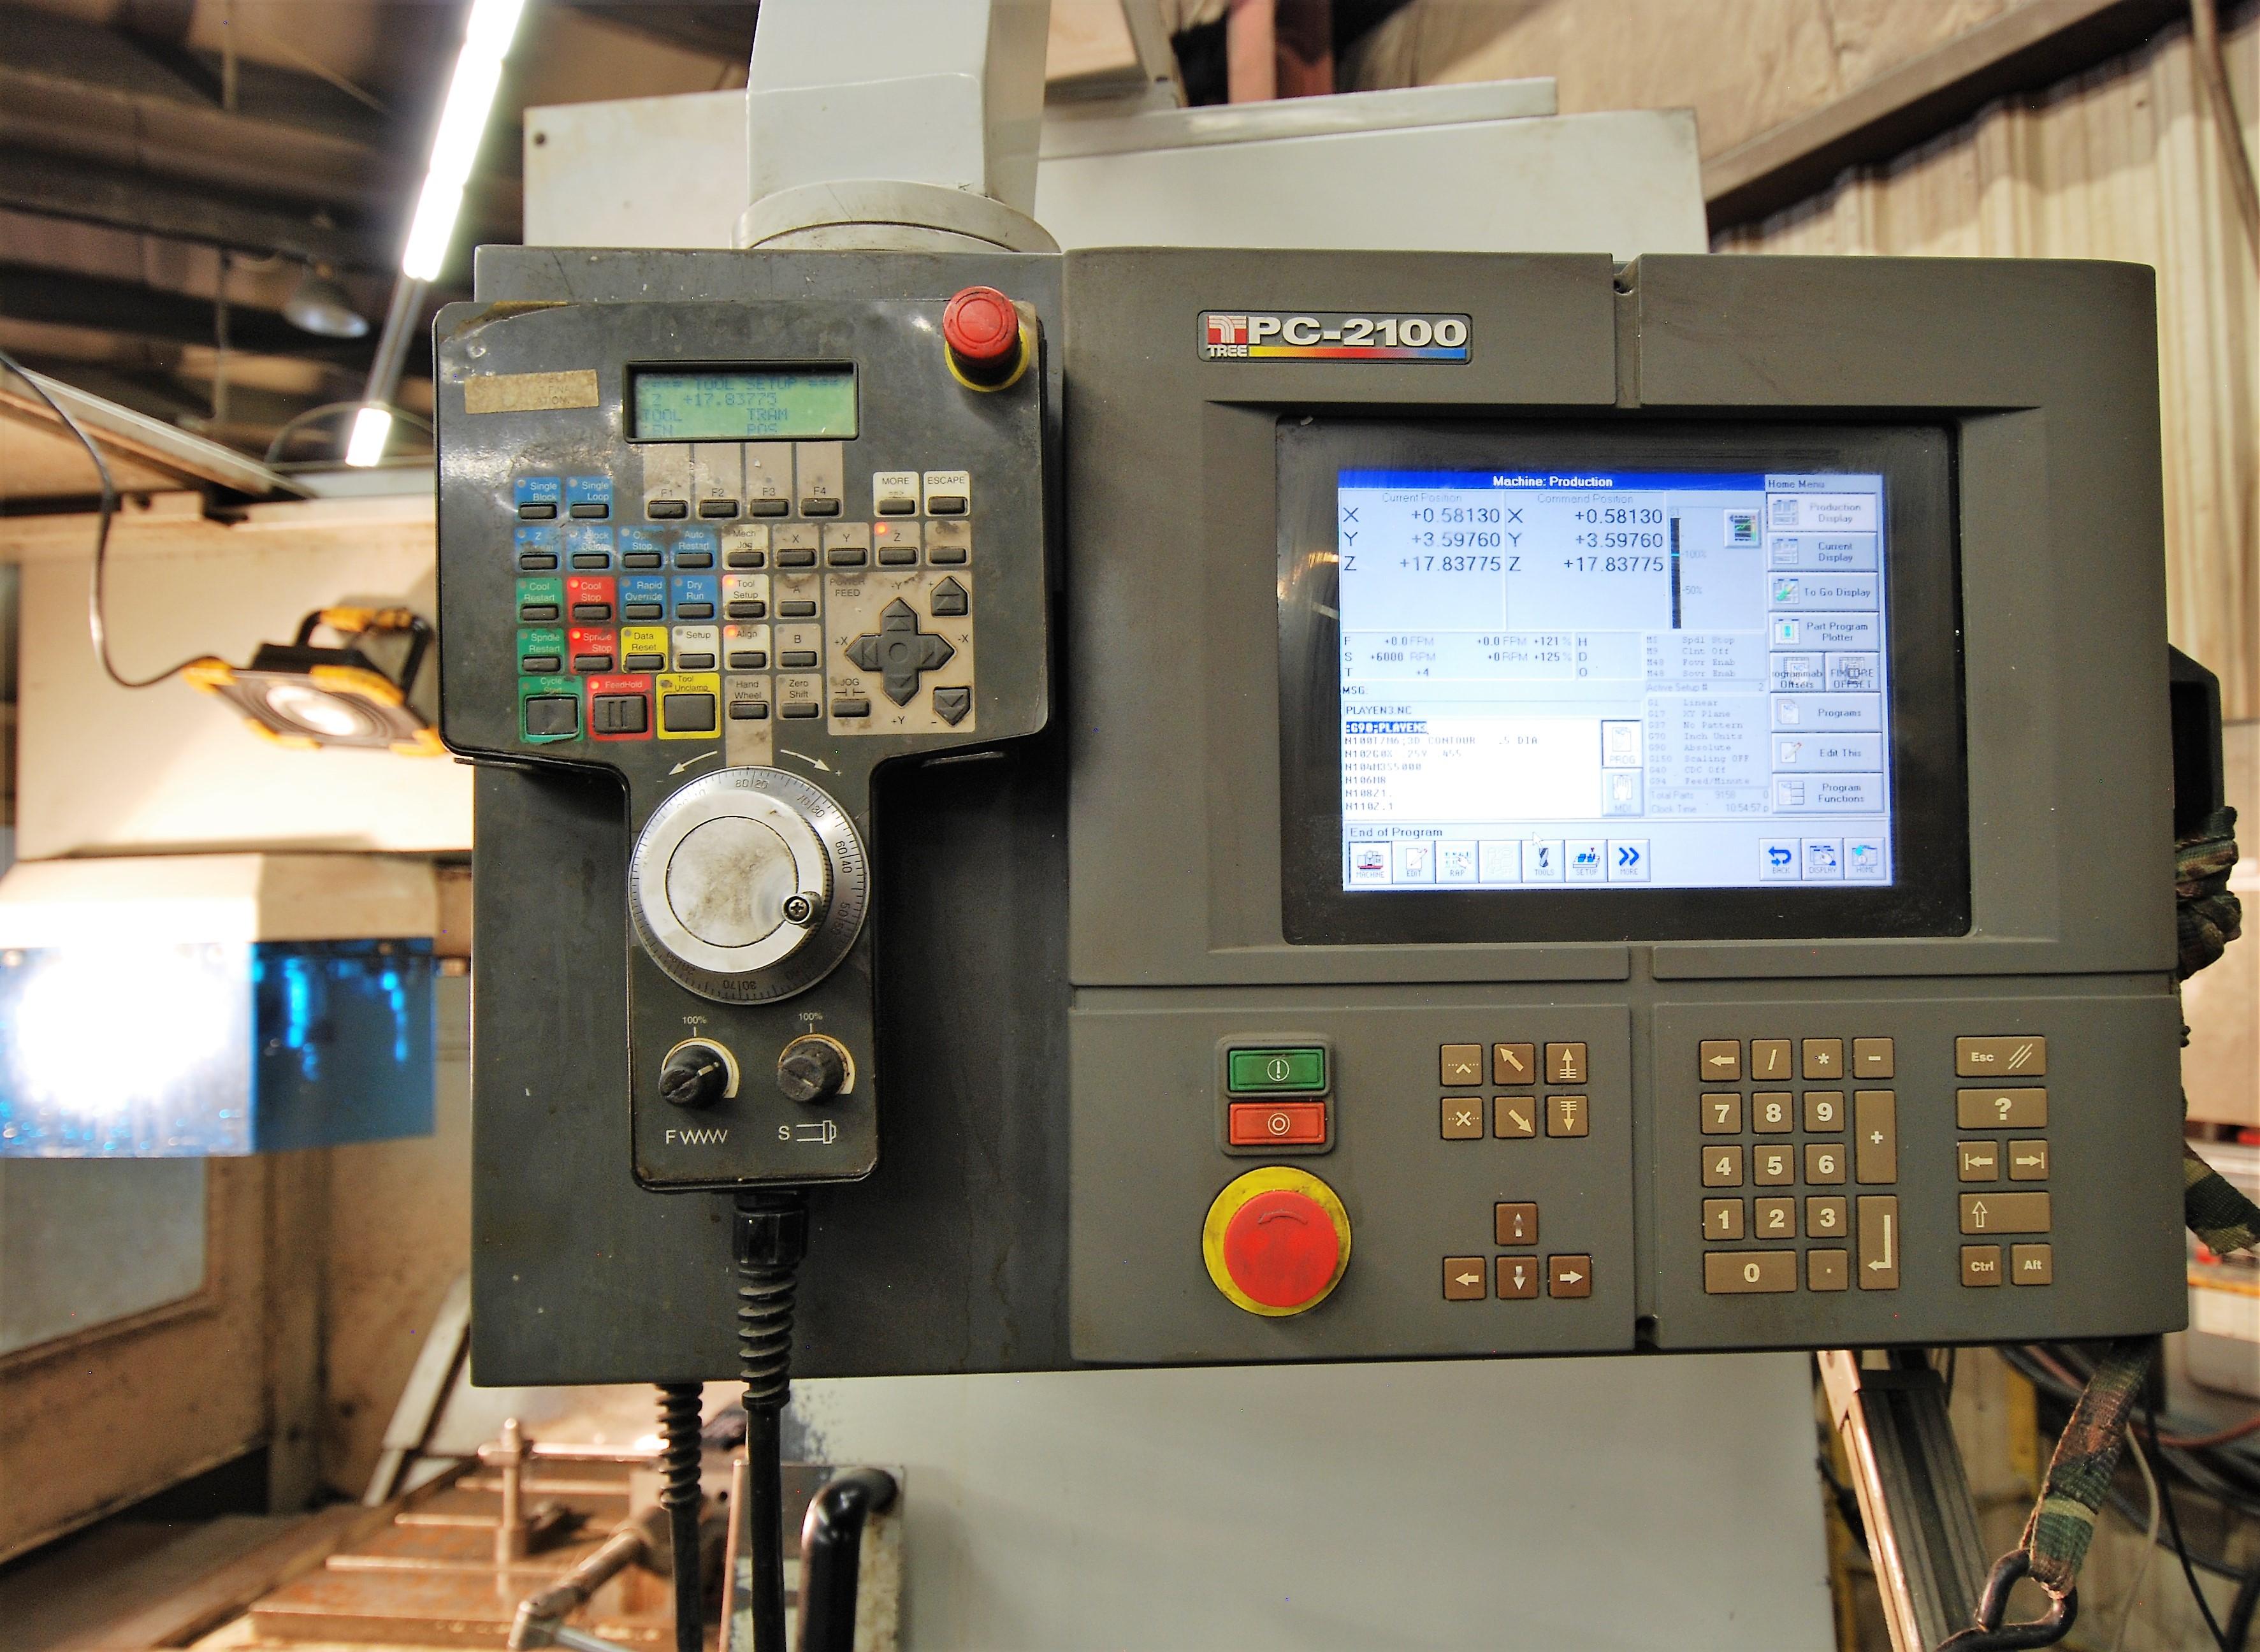 "TREEVMC 800/20 CNC VERTICAL MACHINING CENTER, S/N TS80900014U, PC-2100 CNC CONTROL, ATC, 25"" x - Image 3 of 16"